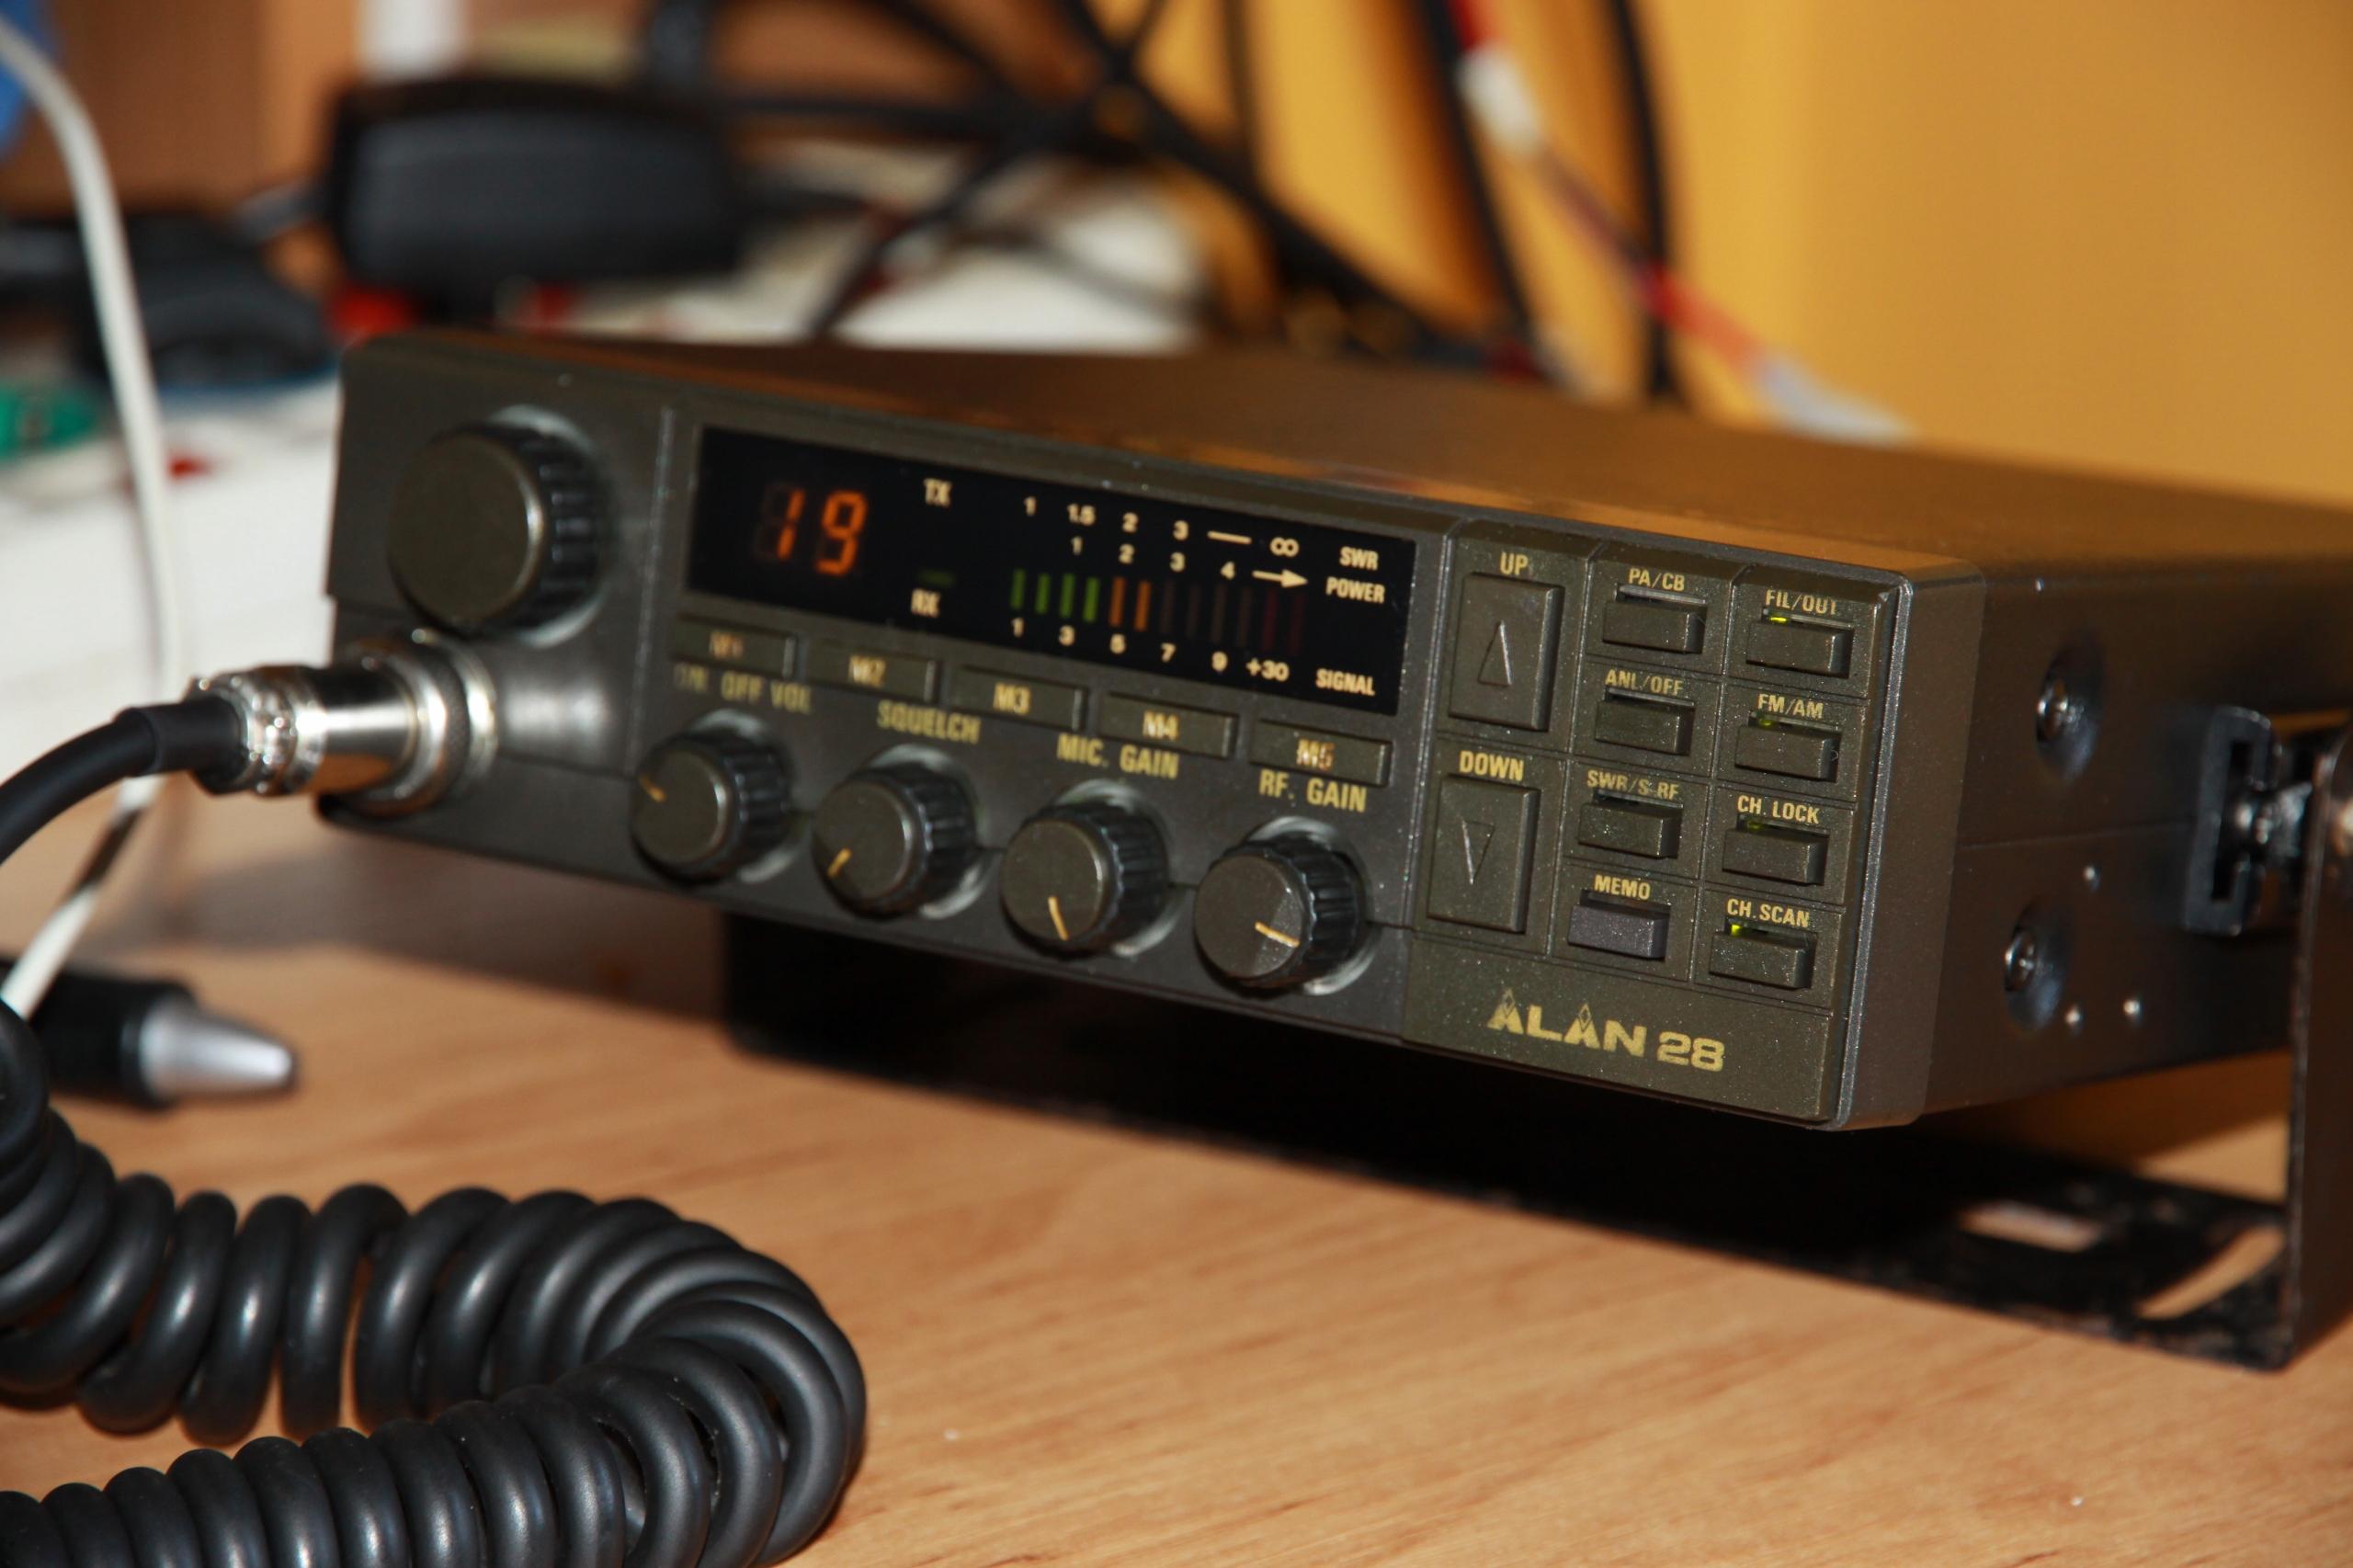 CB Radio Alan 28 Kolekcjonerski!!!